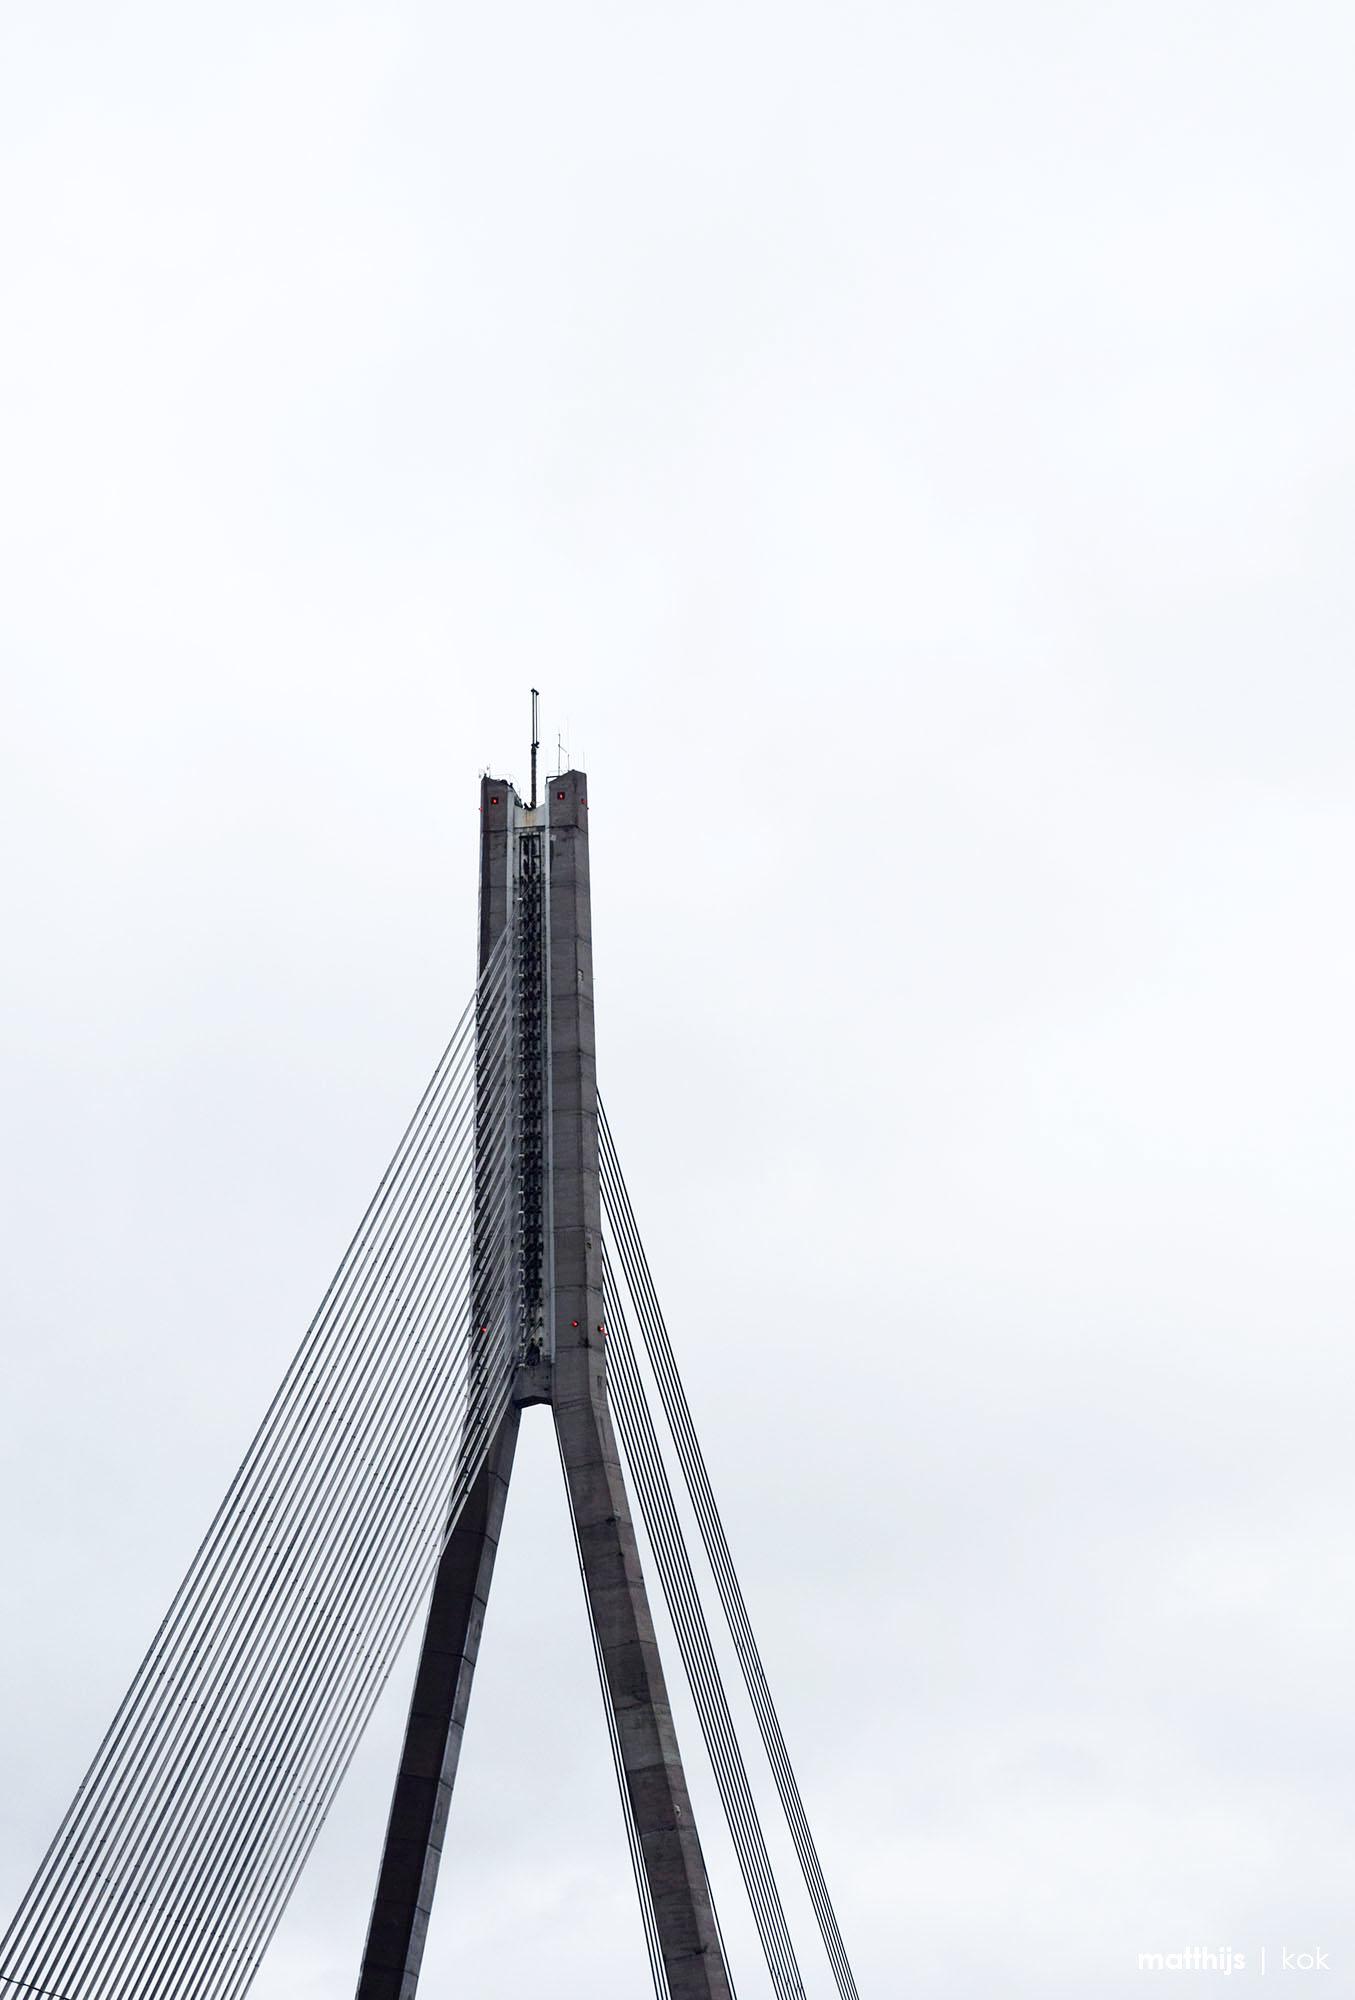 Vanšu Bridge, Riga, Latvia | Photo by Matthijs Kok